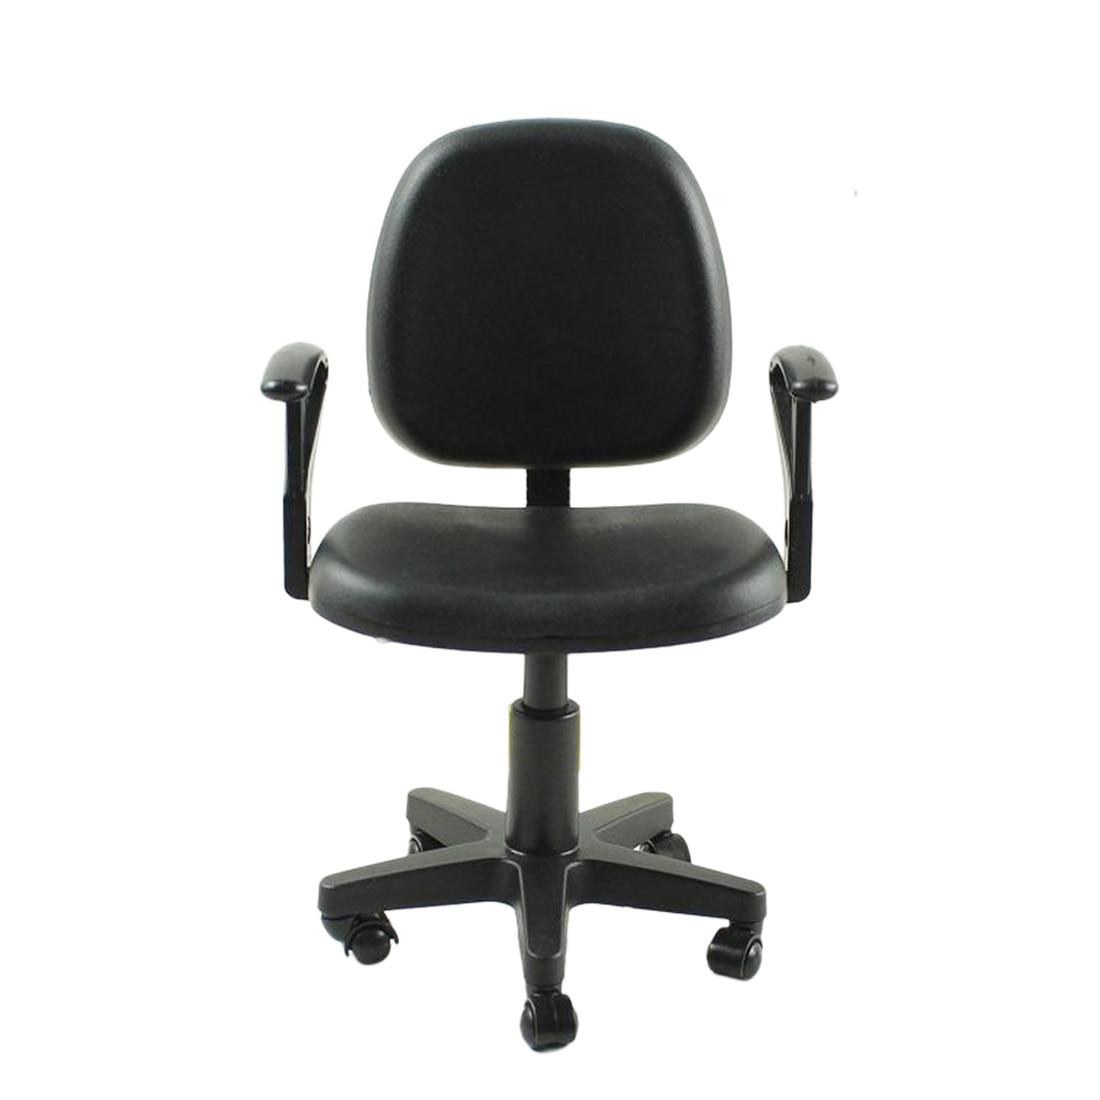 Dollhouse Mini Office Computer Chair DIY Sand Table Model Toy